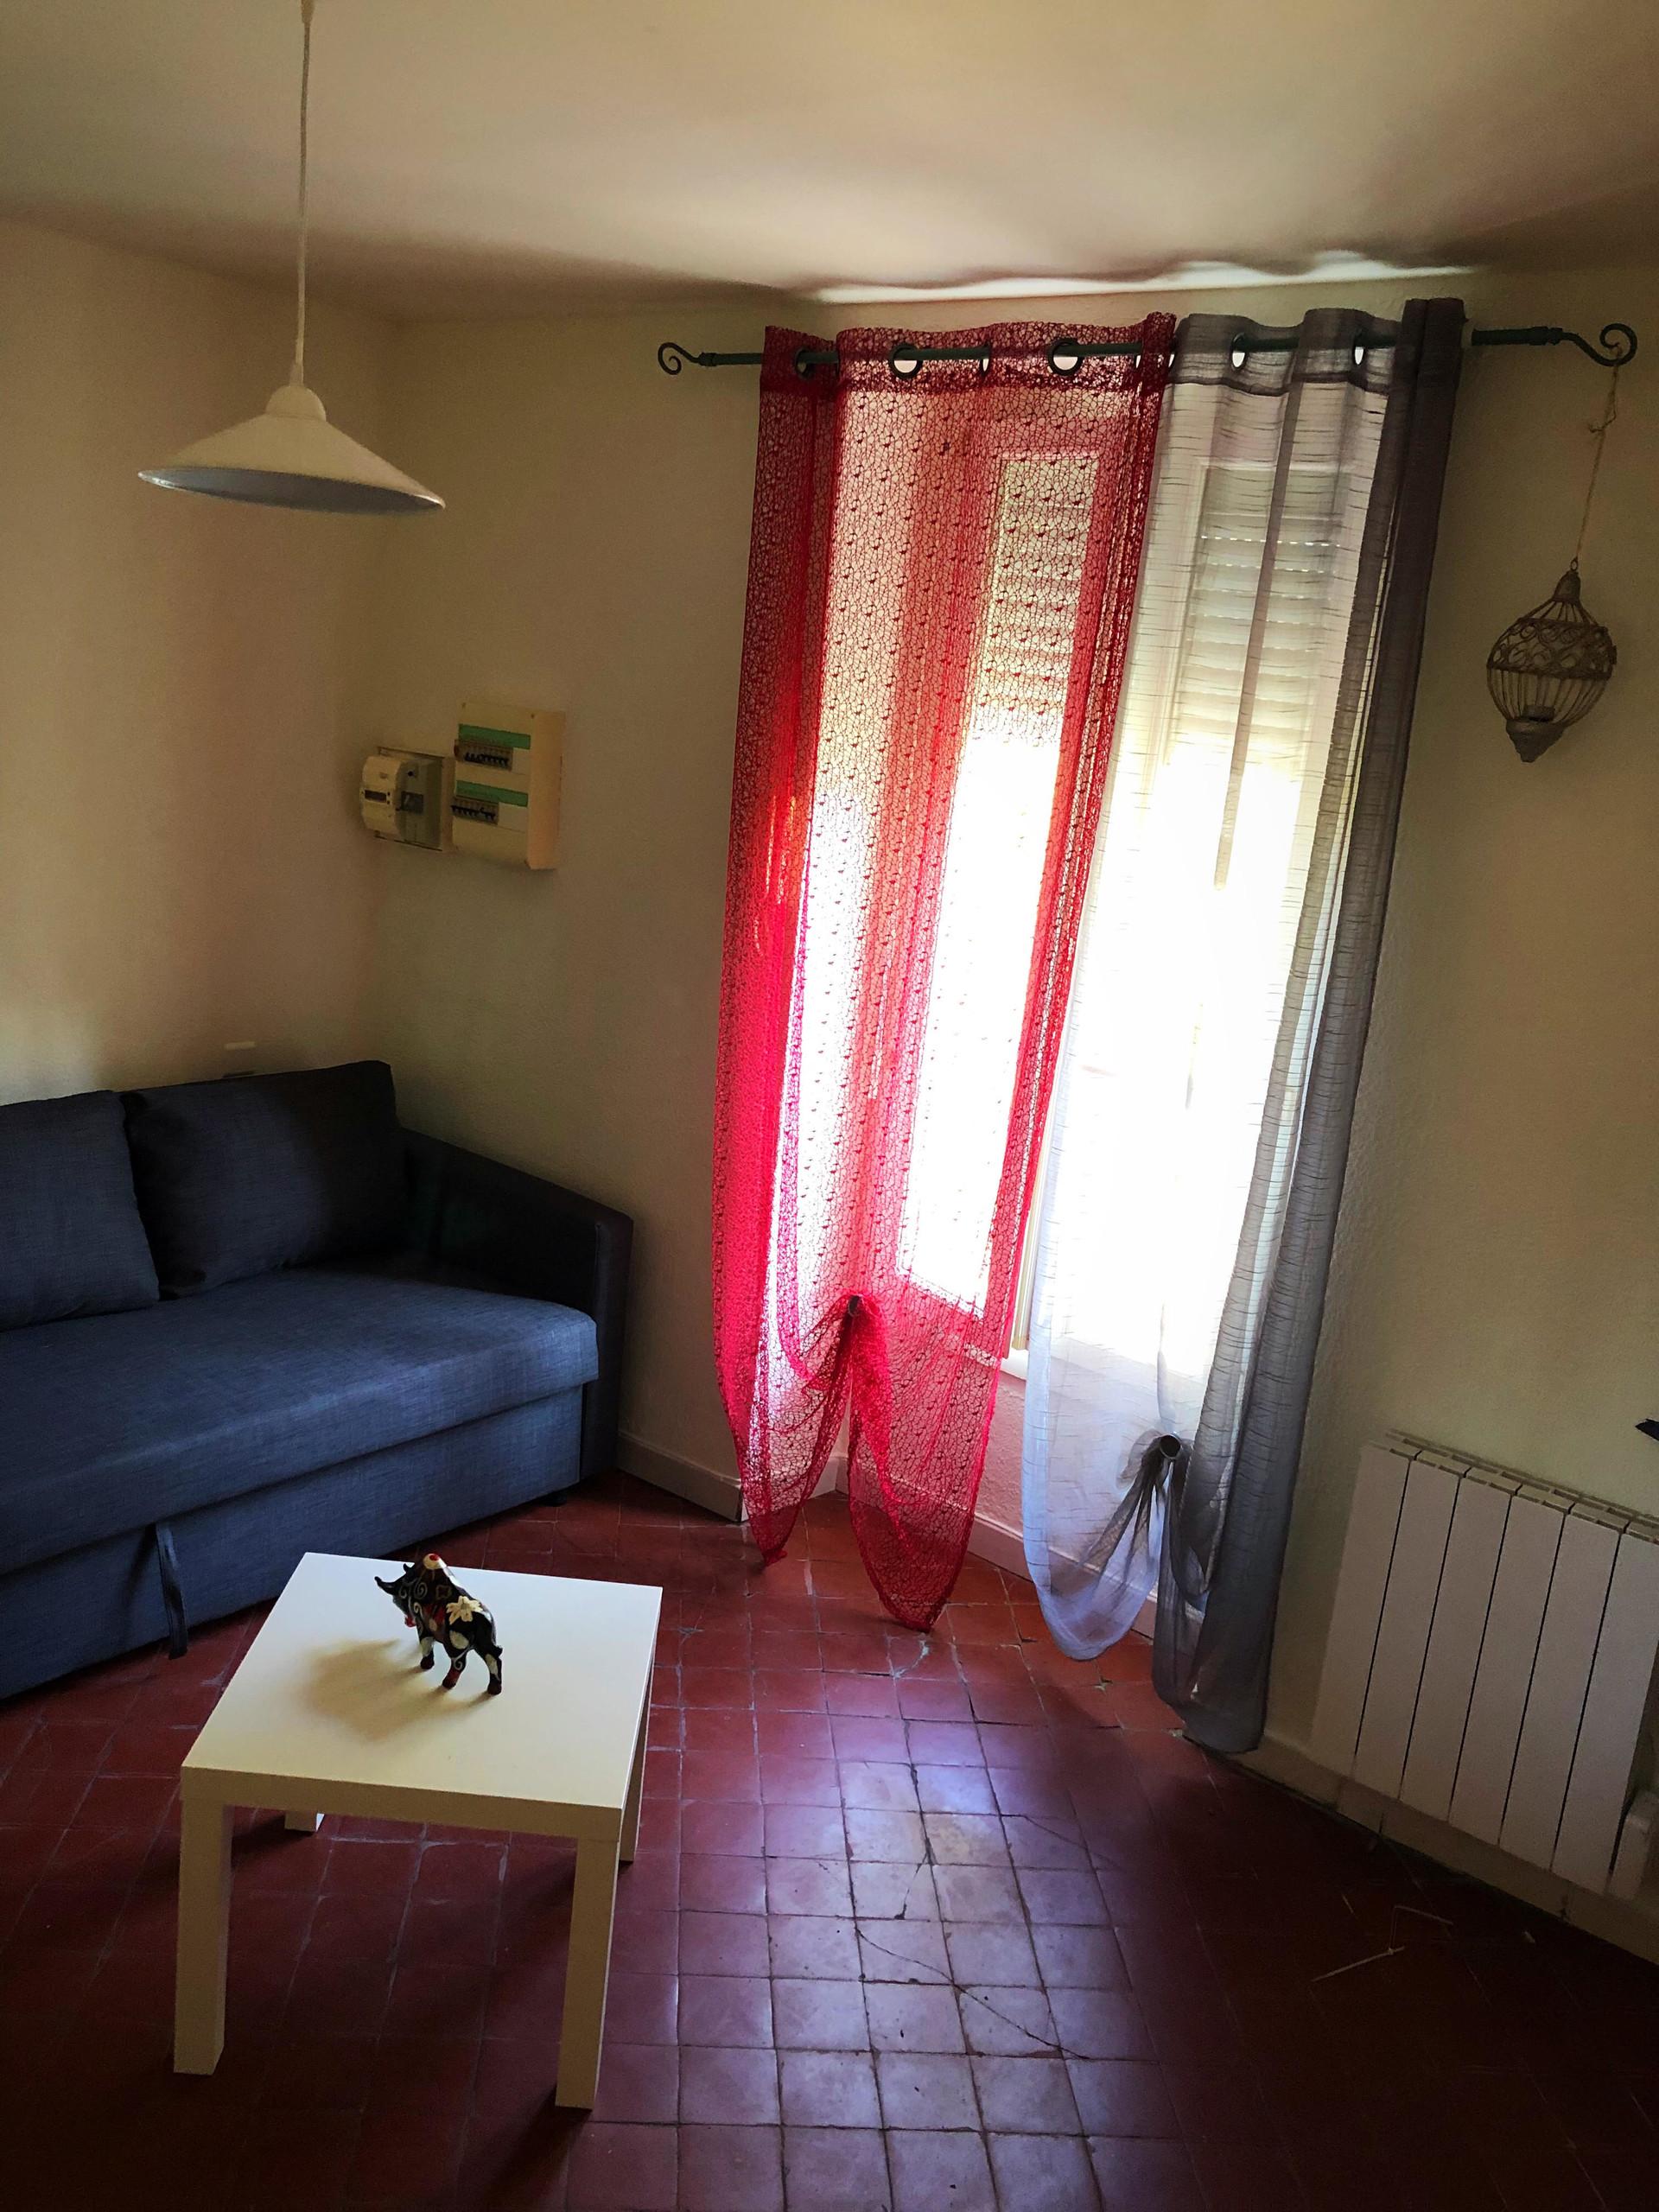 Studio for rent in Avignon with internet